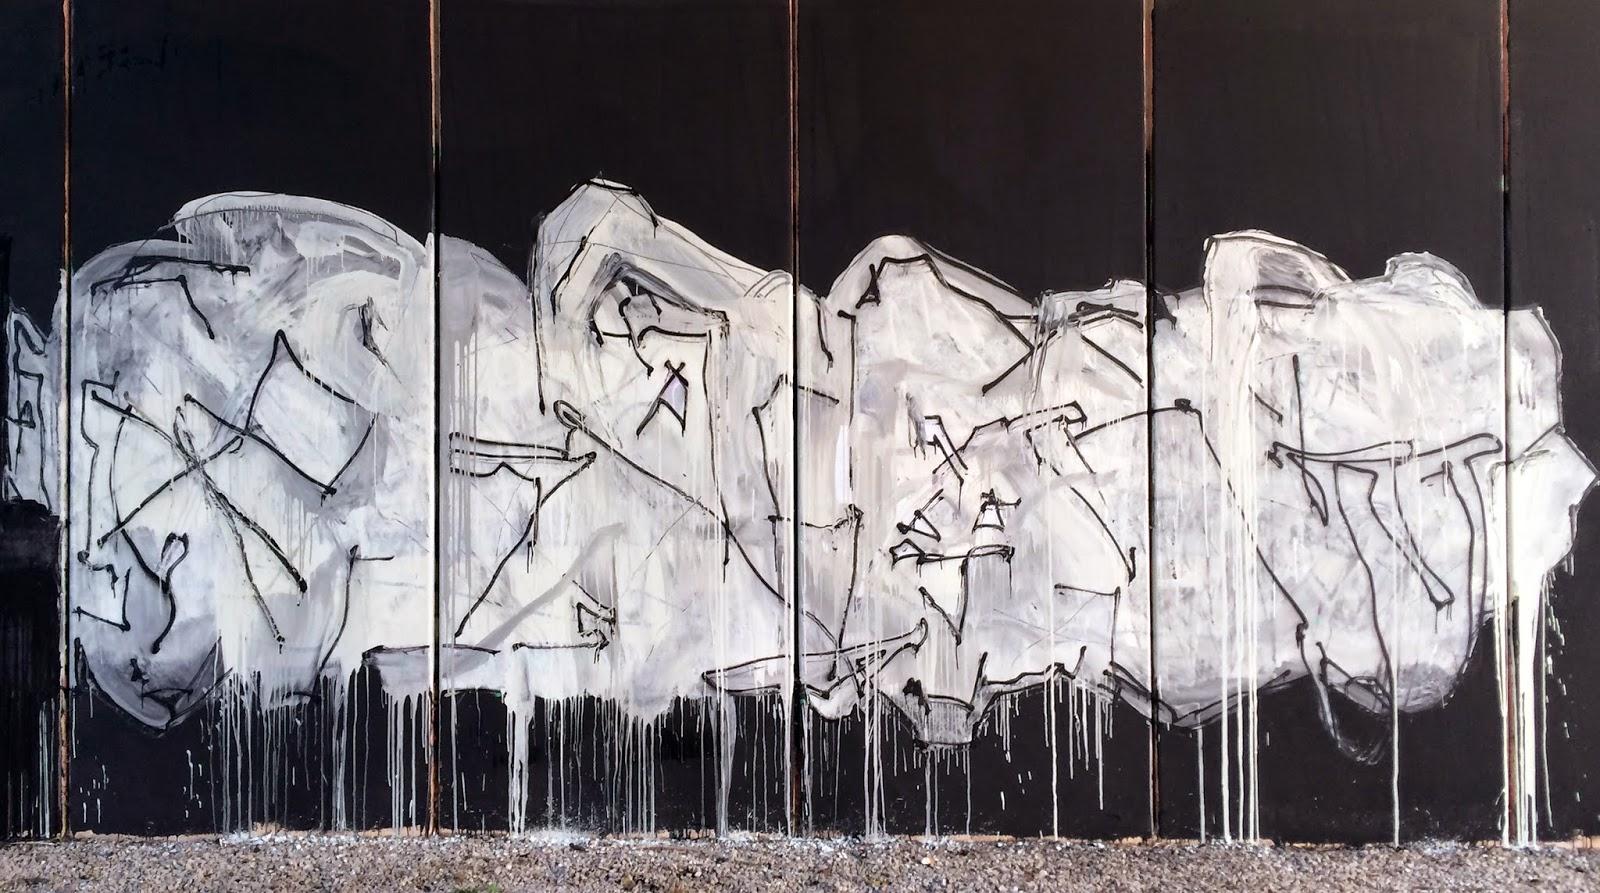 abik-the-f-new-mural-01